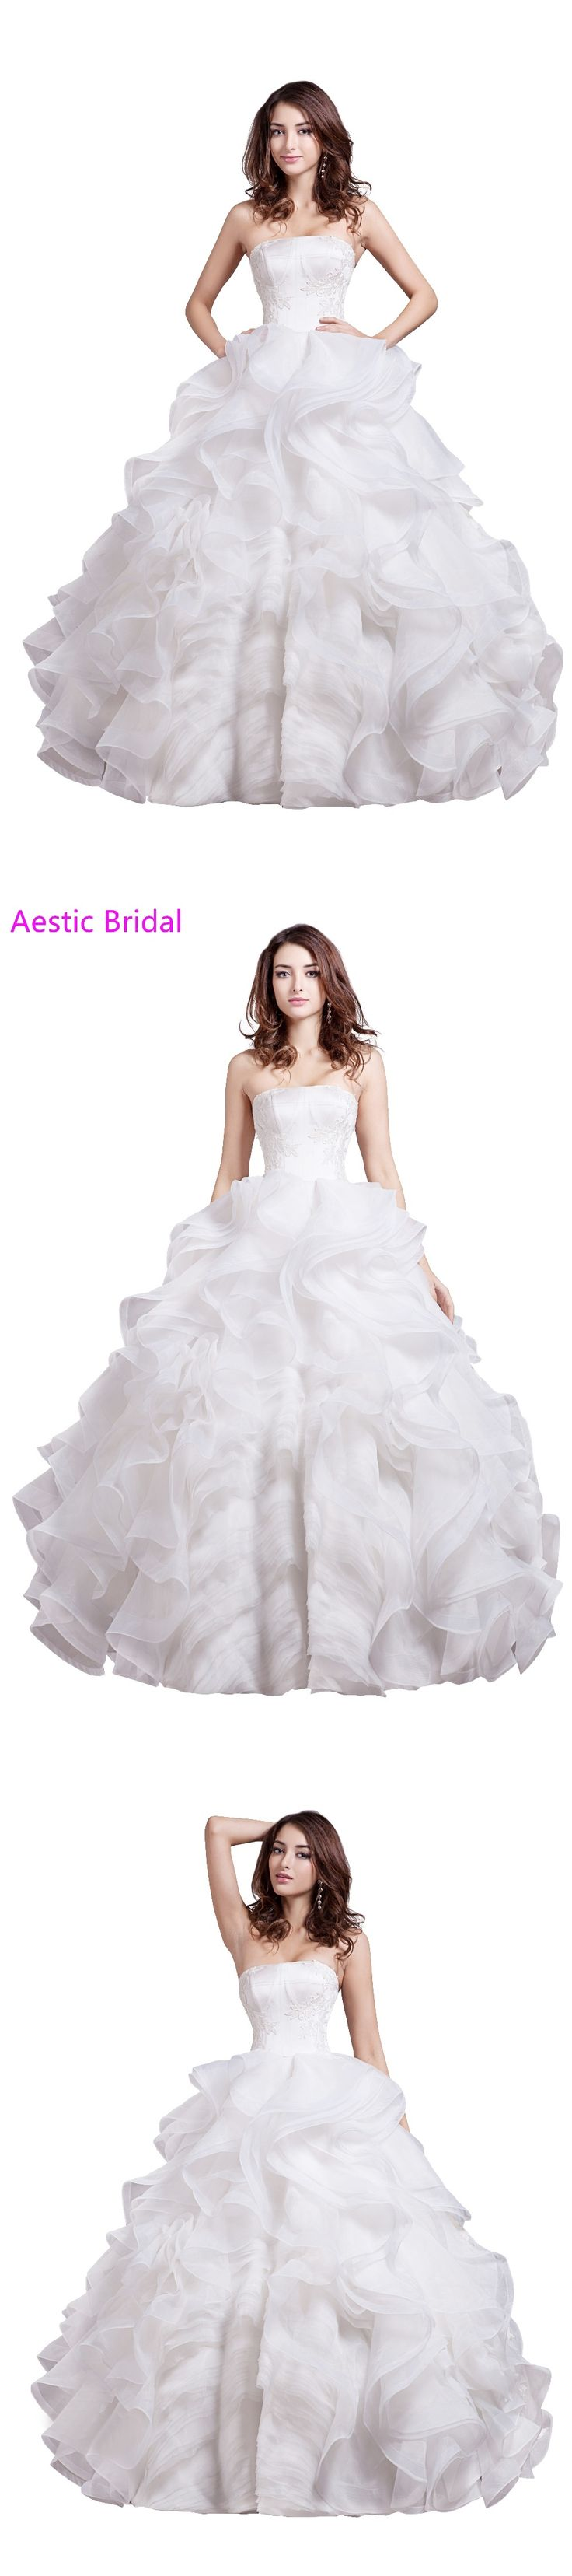 Robe De Mariee Ball Gown White Strapless Organza Wedding Dress With Ruffles Vestido Noiva